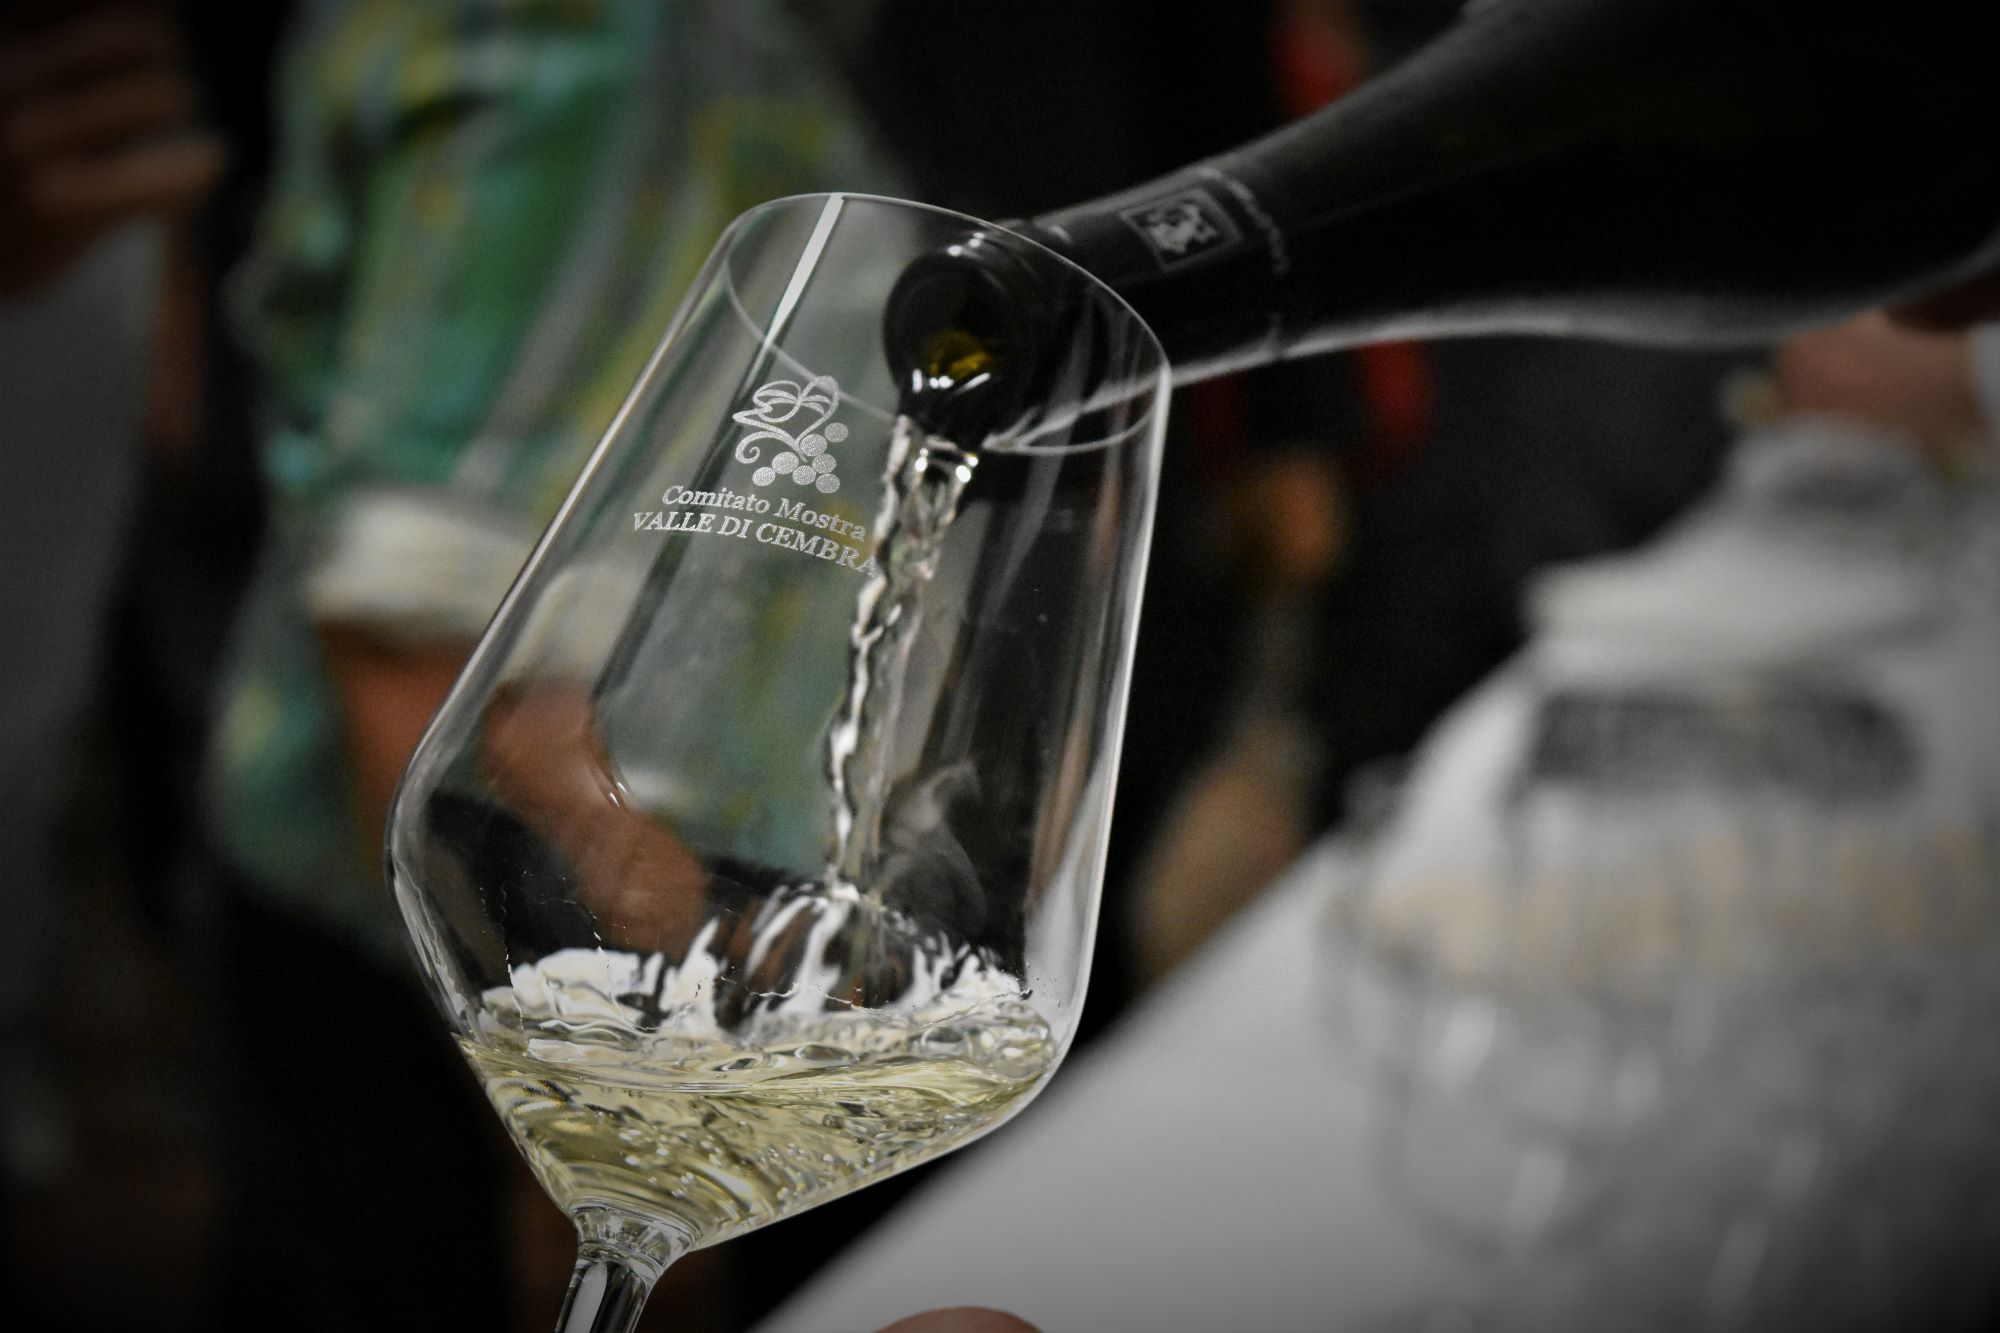 XVII Concorso Internazionale Vini Müller Thurgau